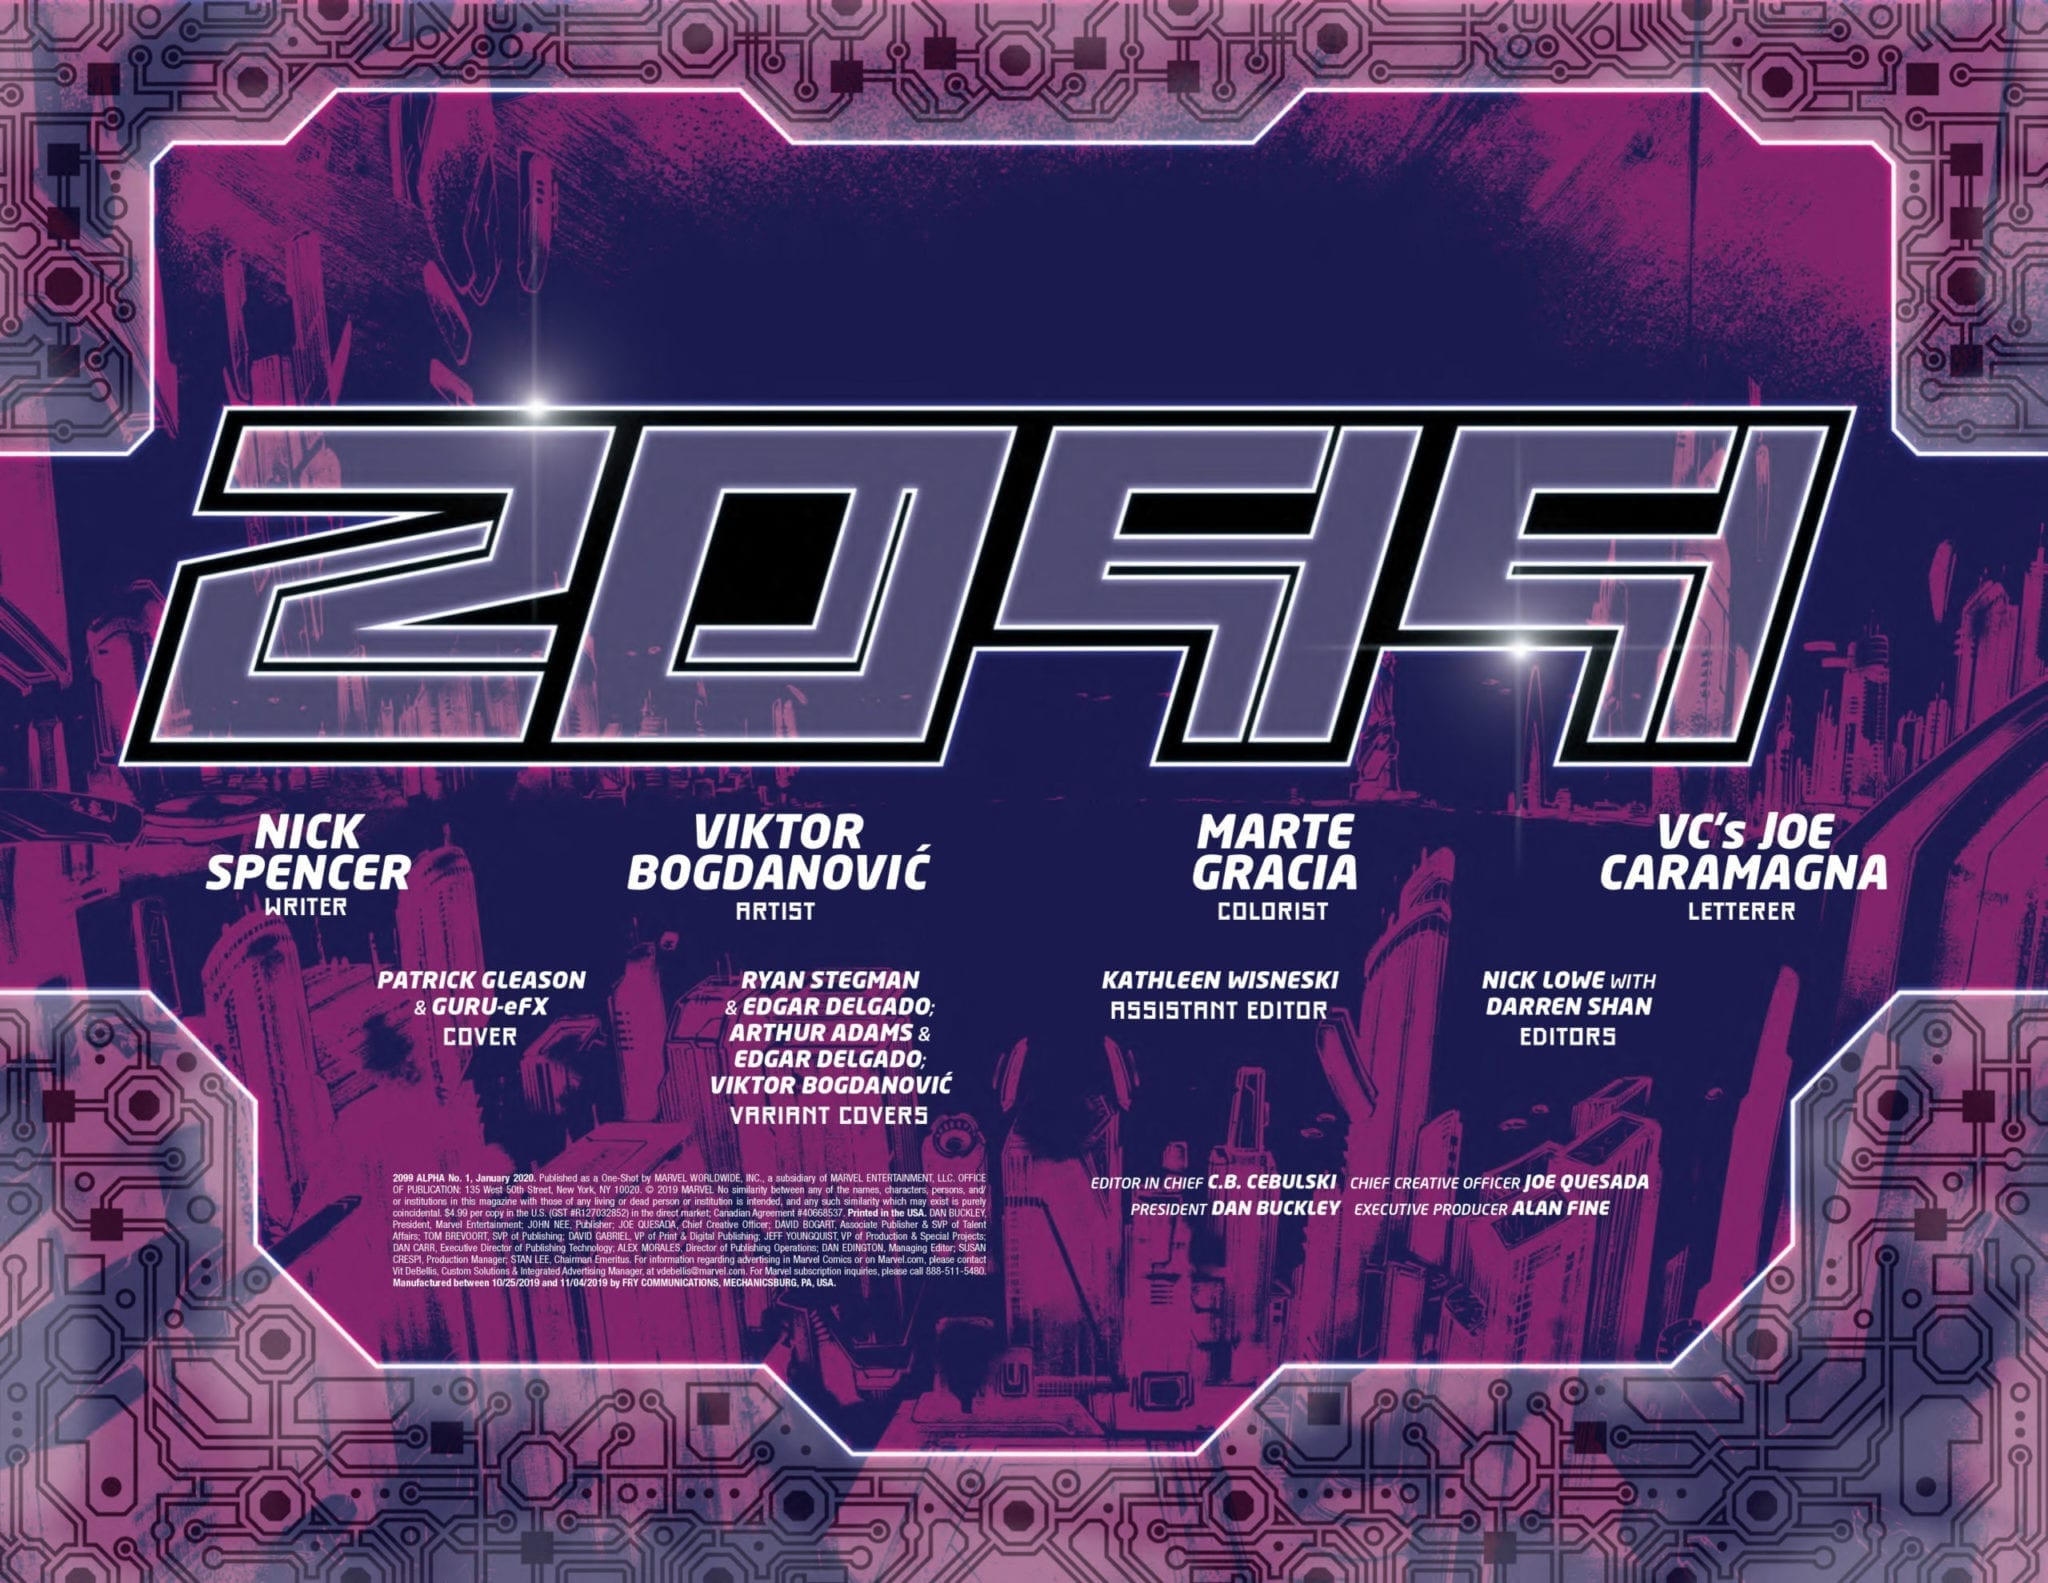 marvel comics 2099 alpha #1 exclusive preview